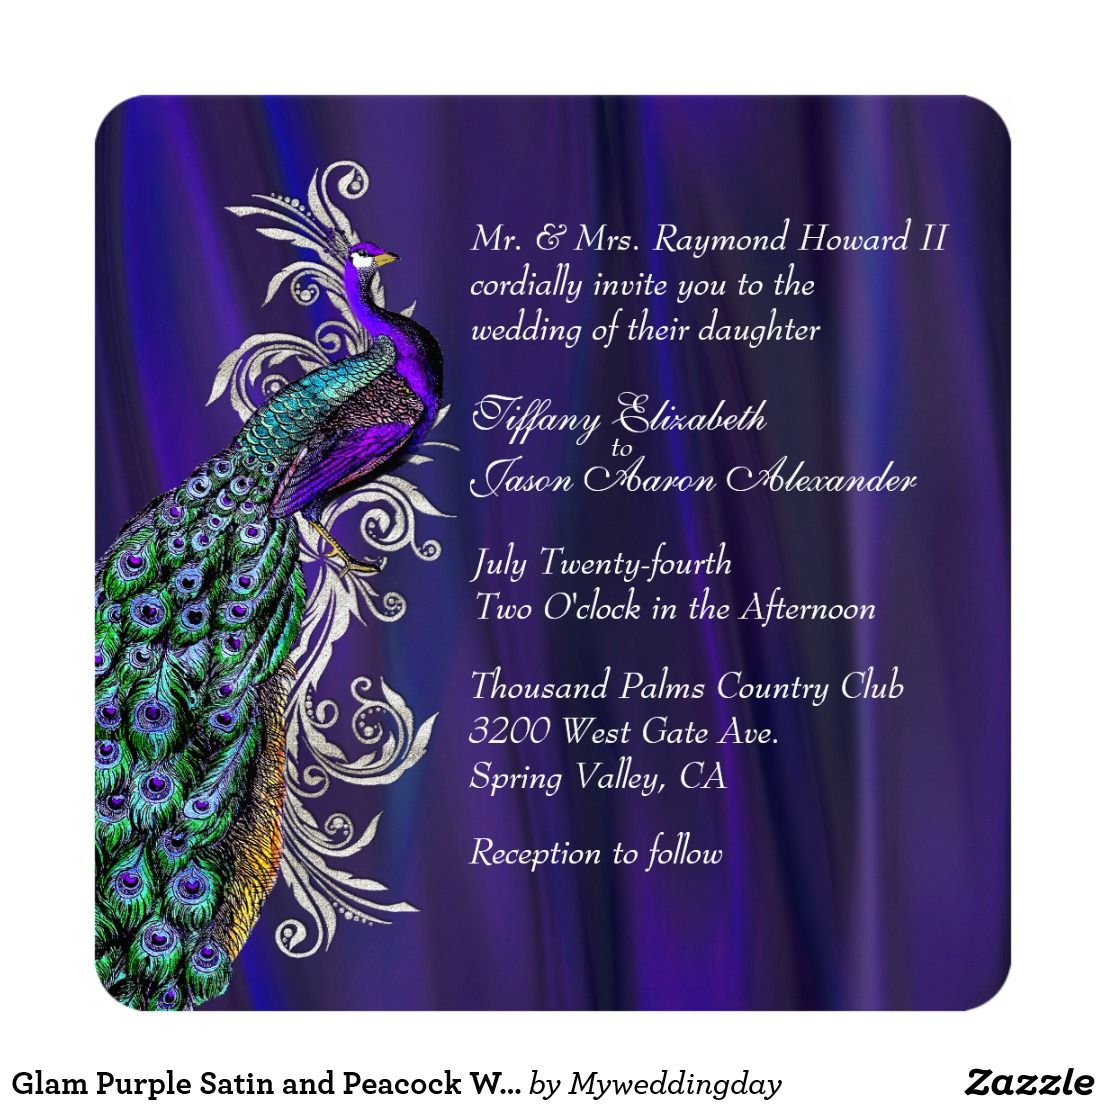 Glam Purple Satin And Peacock Wedding Invitation Purple Satin And